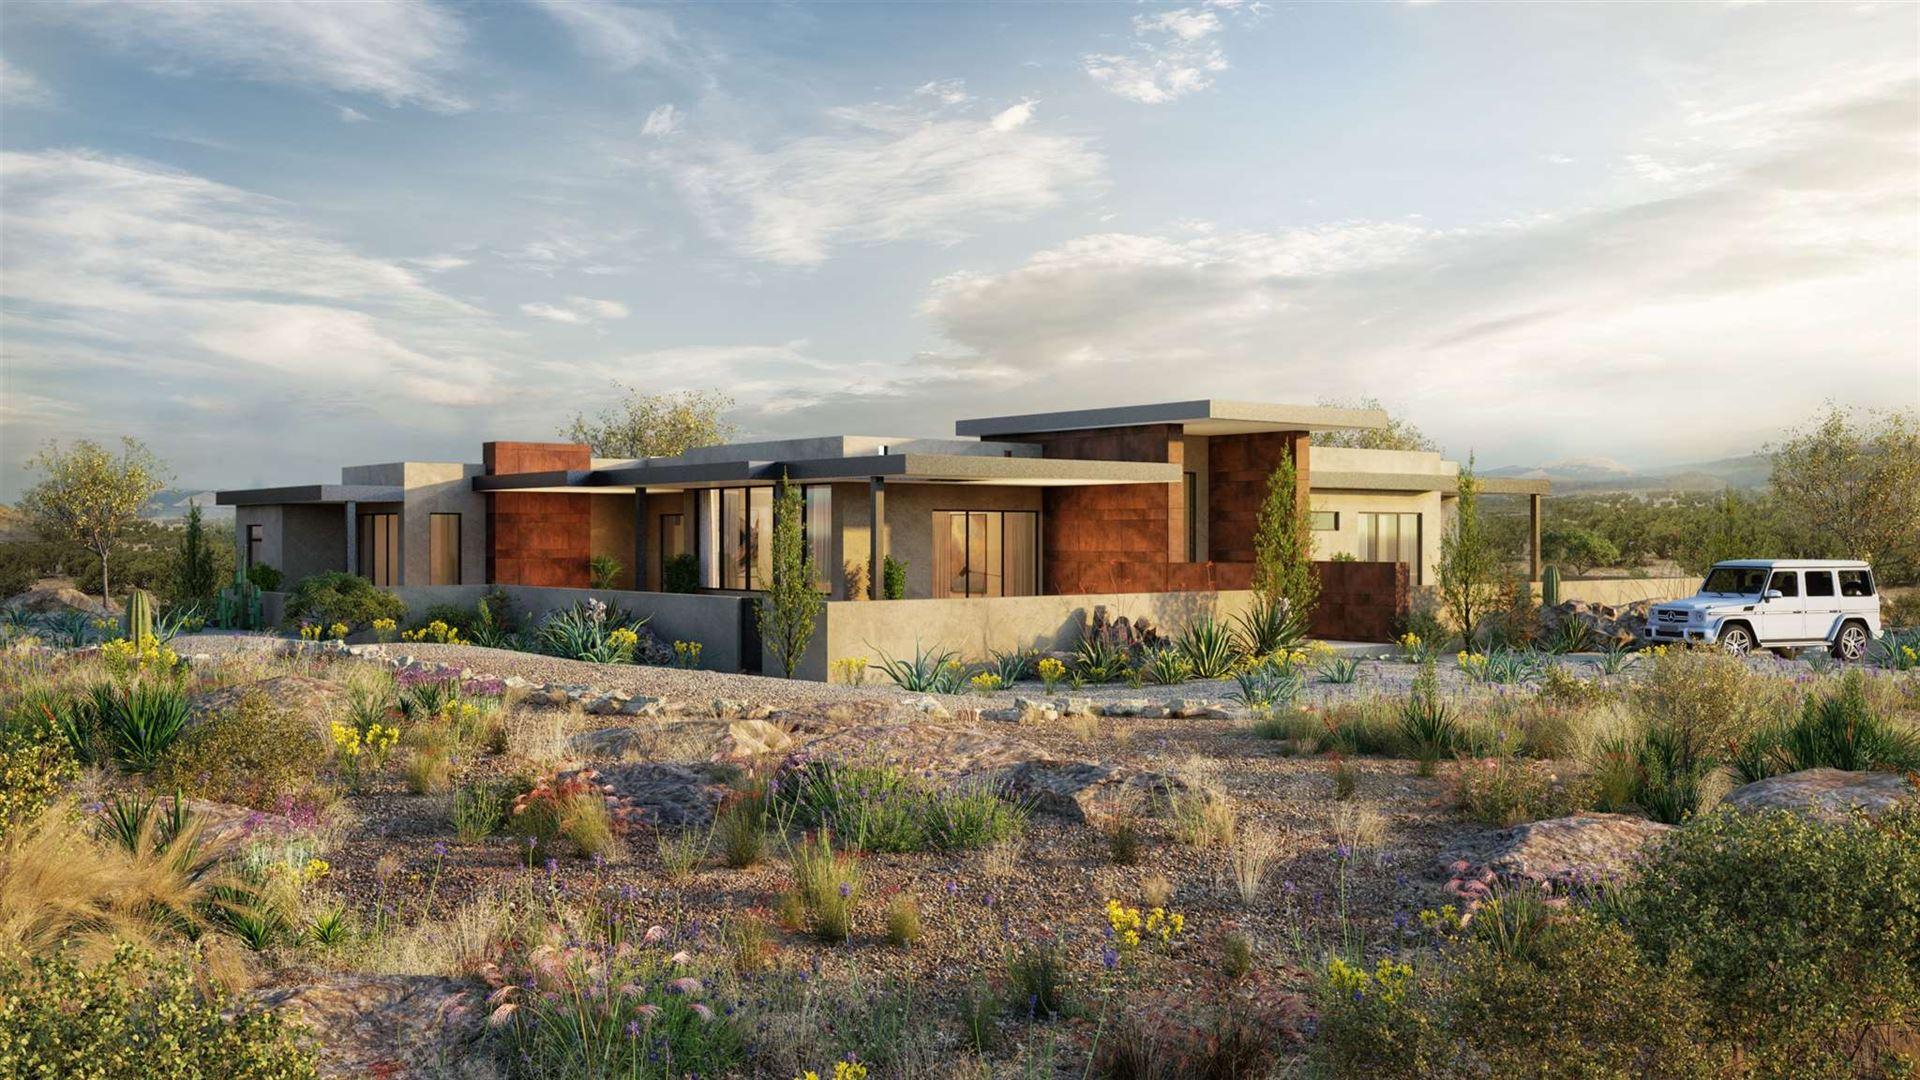 18 Via Oso (Black Mesa, Lot 4), Santa Fe, NM 87506-8559 - #: 201904987